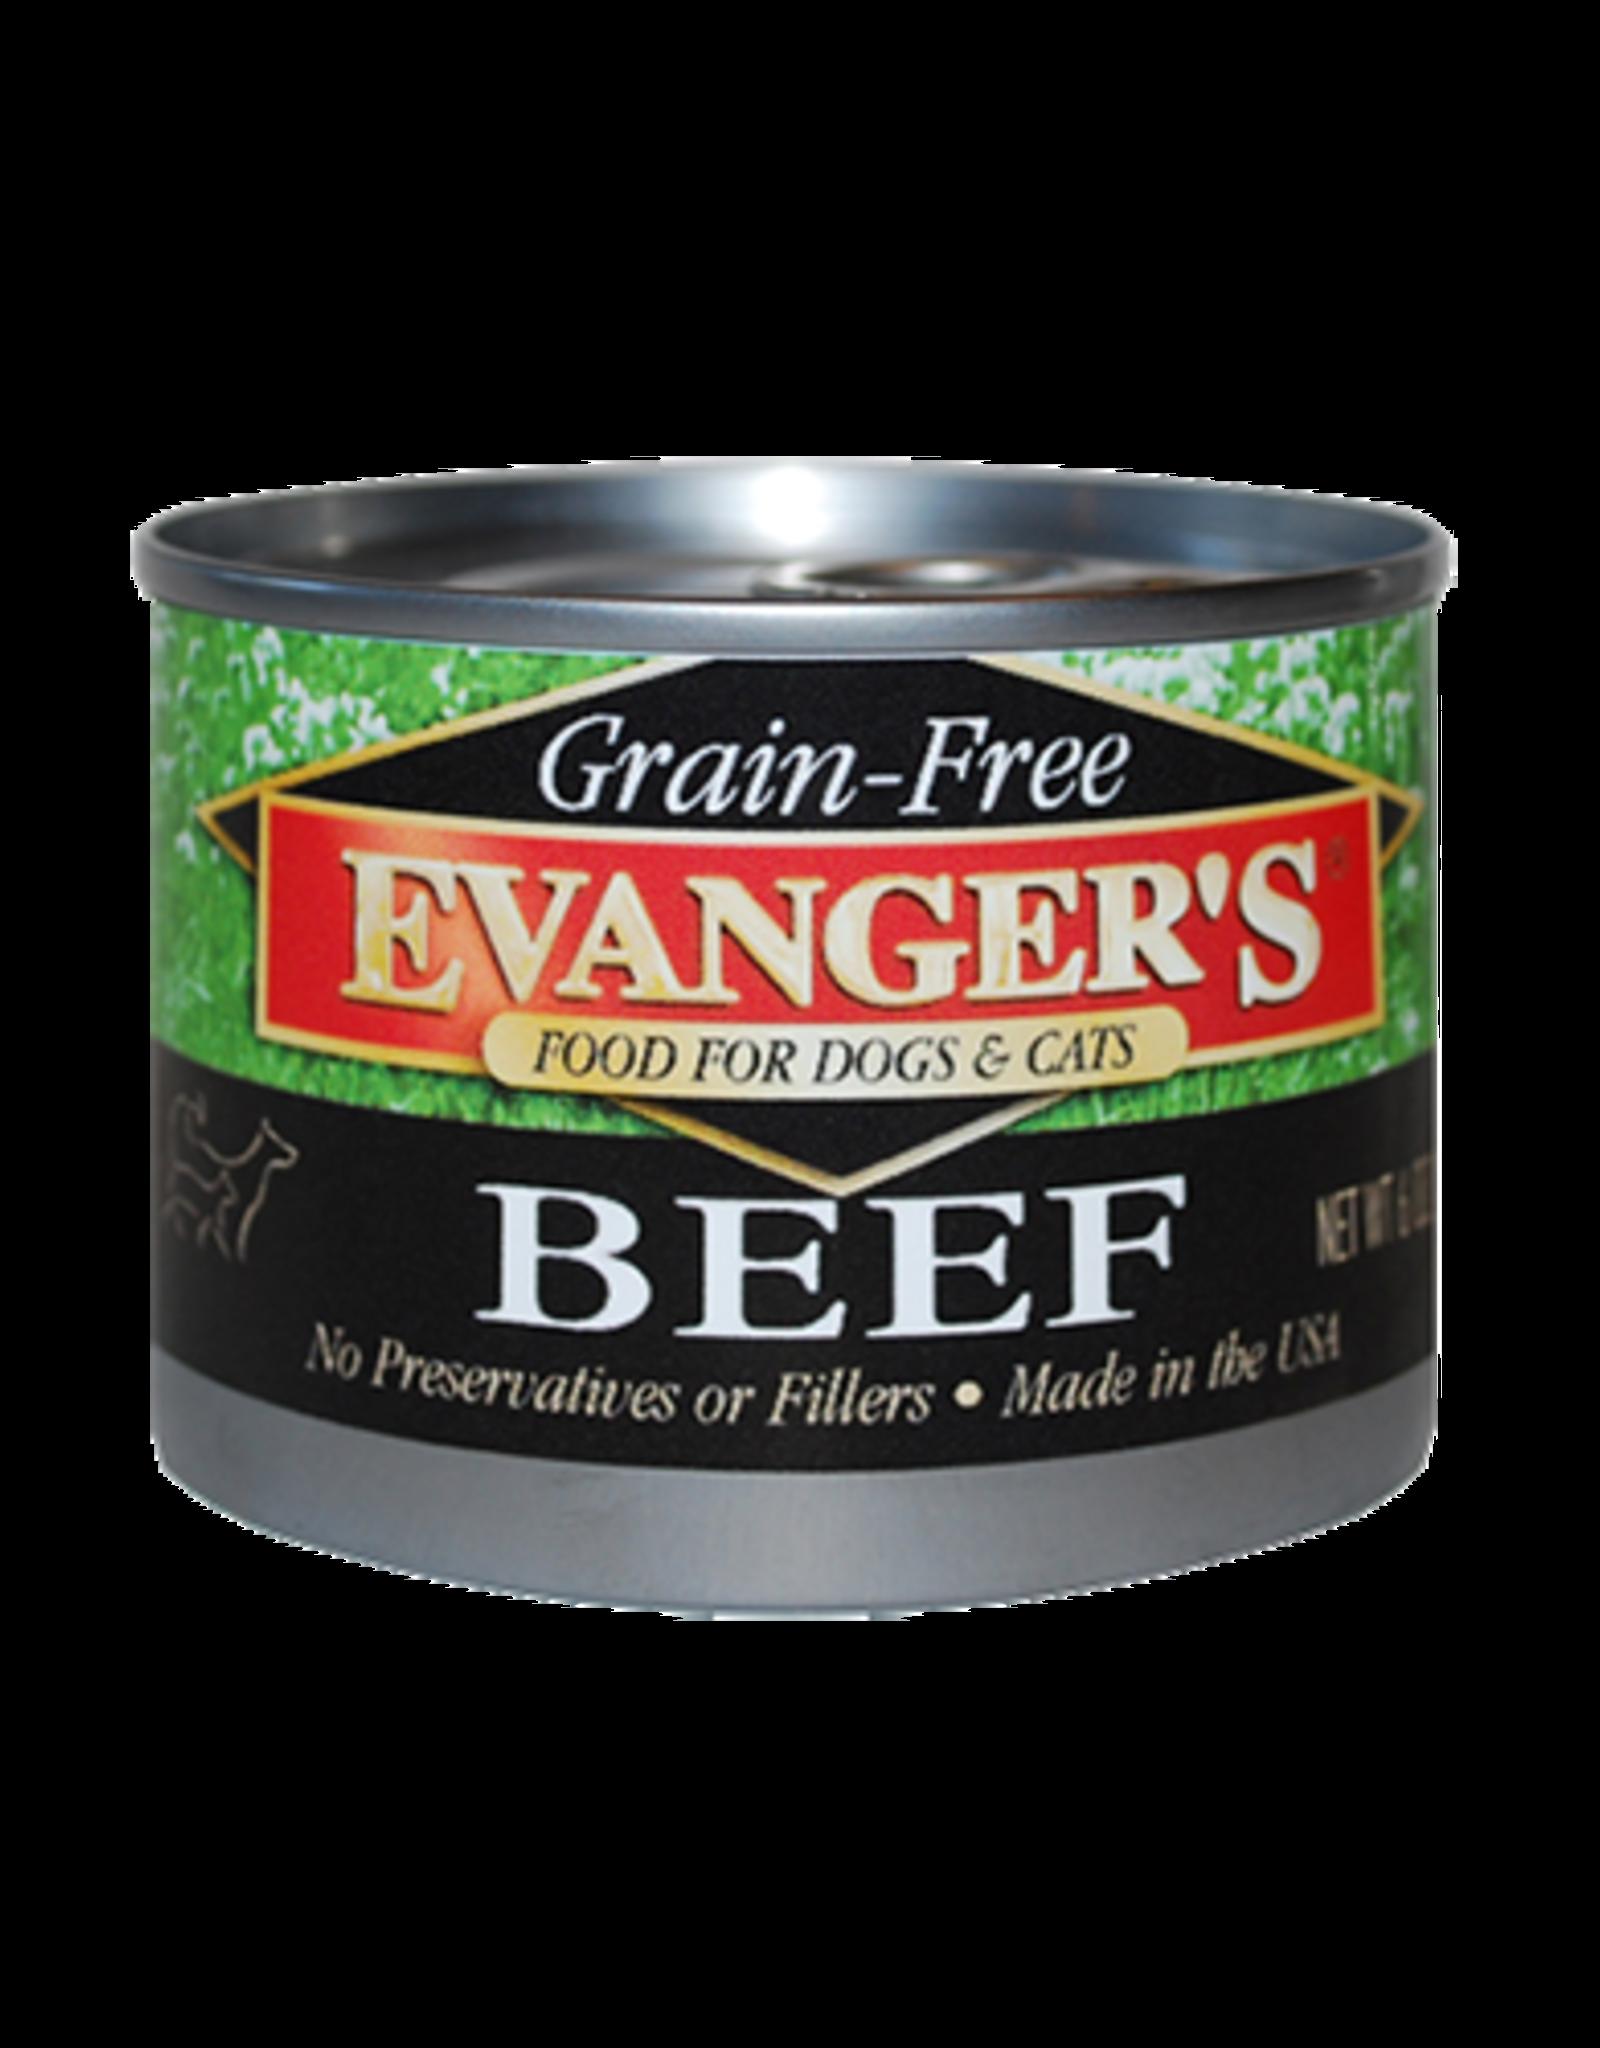 EVANGER'S EVANGERS GRAIN FREE BEEF 6OZ CAN